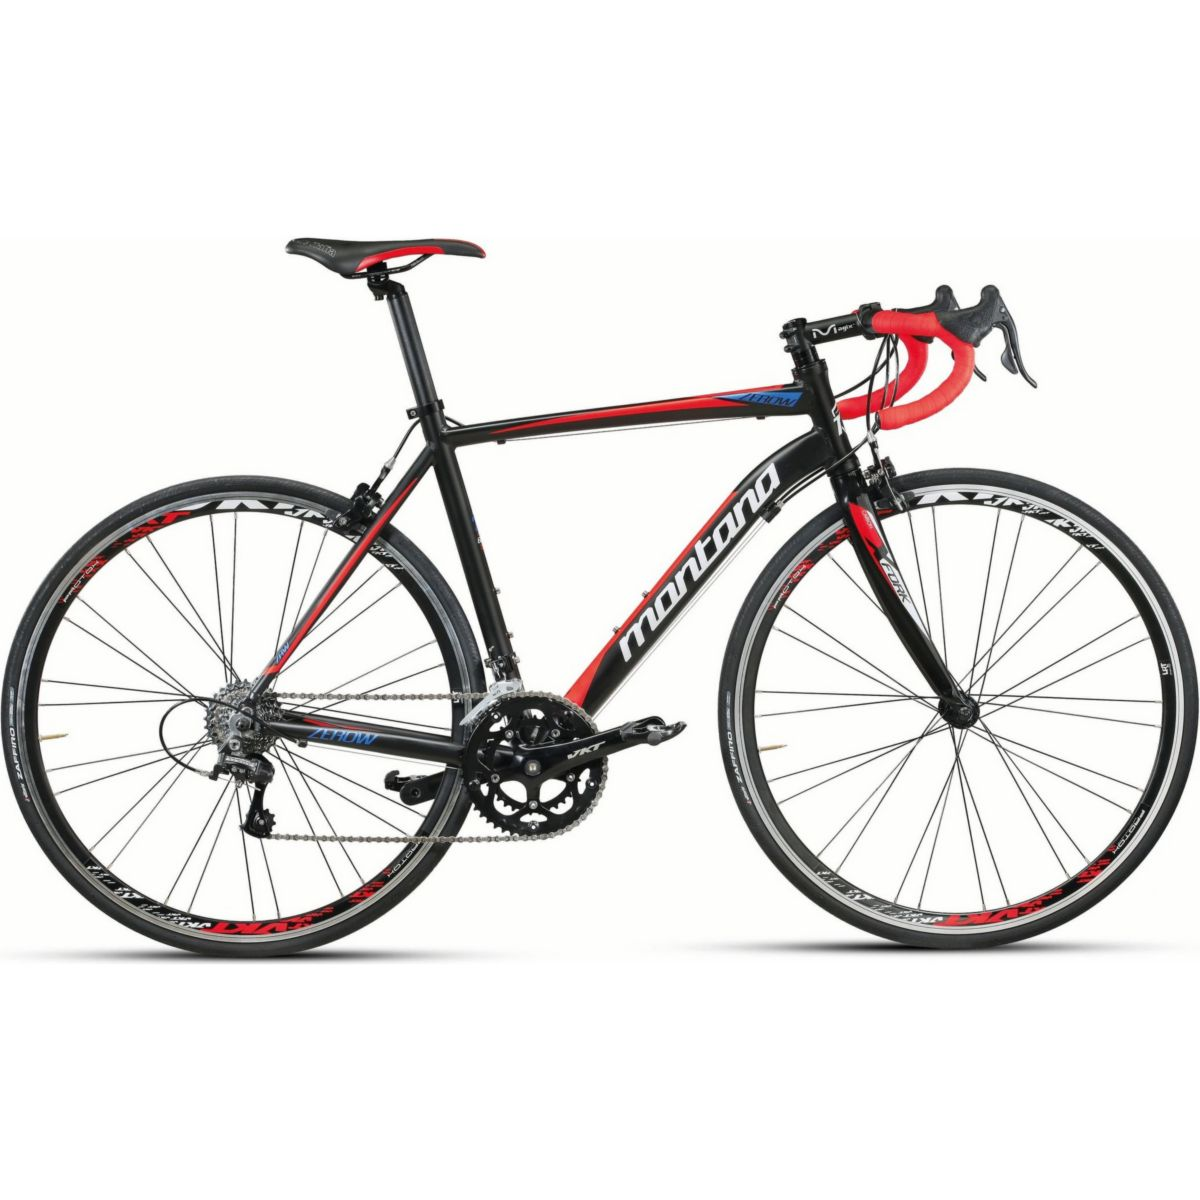 28 Zoll Rennrad Campagnolo 20 Gang Montana Zerow schwarz-rot, 58cm jetztbilligerkaufen